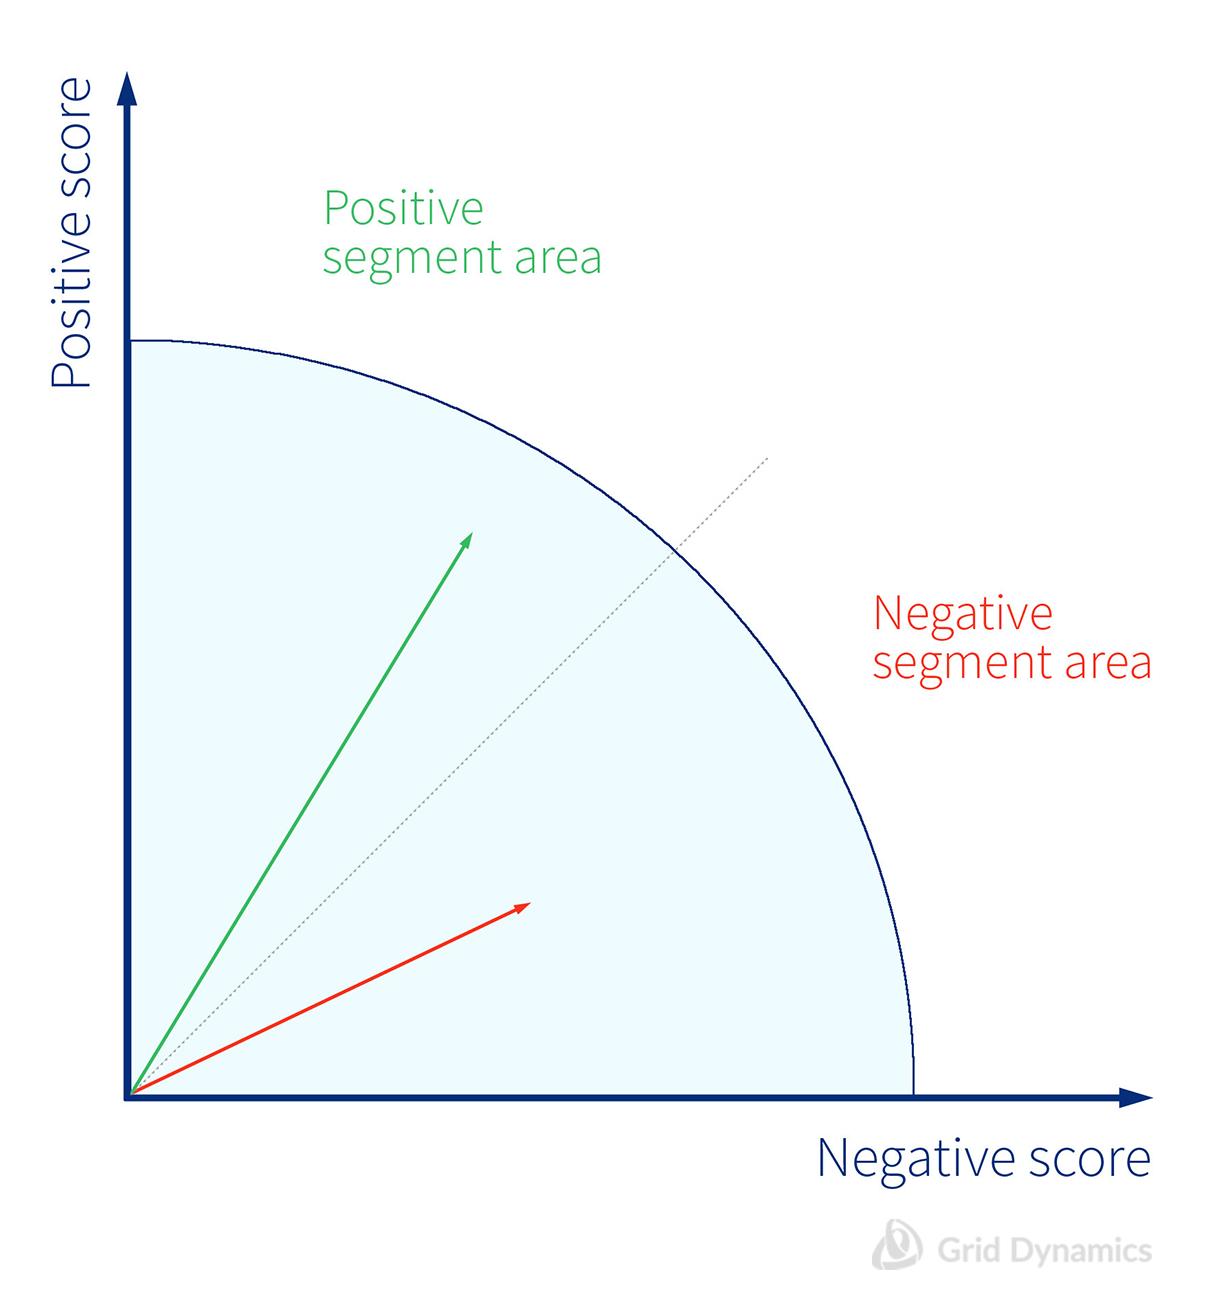 Lexicon based scoring model